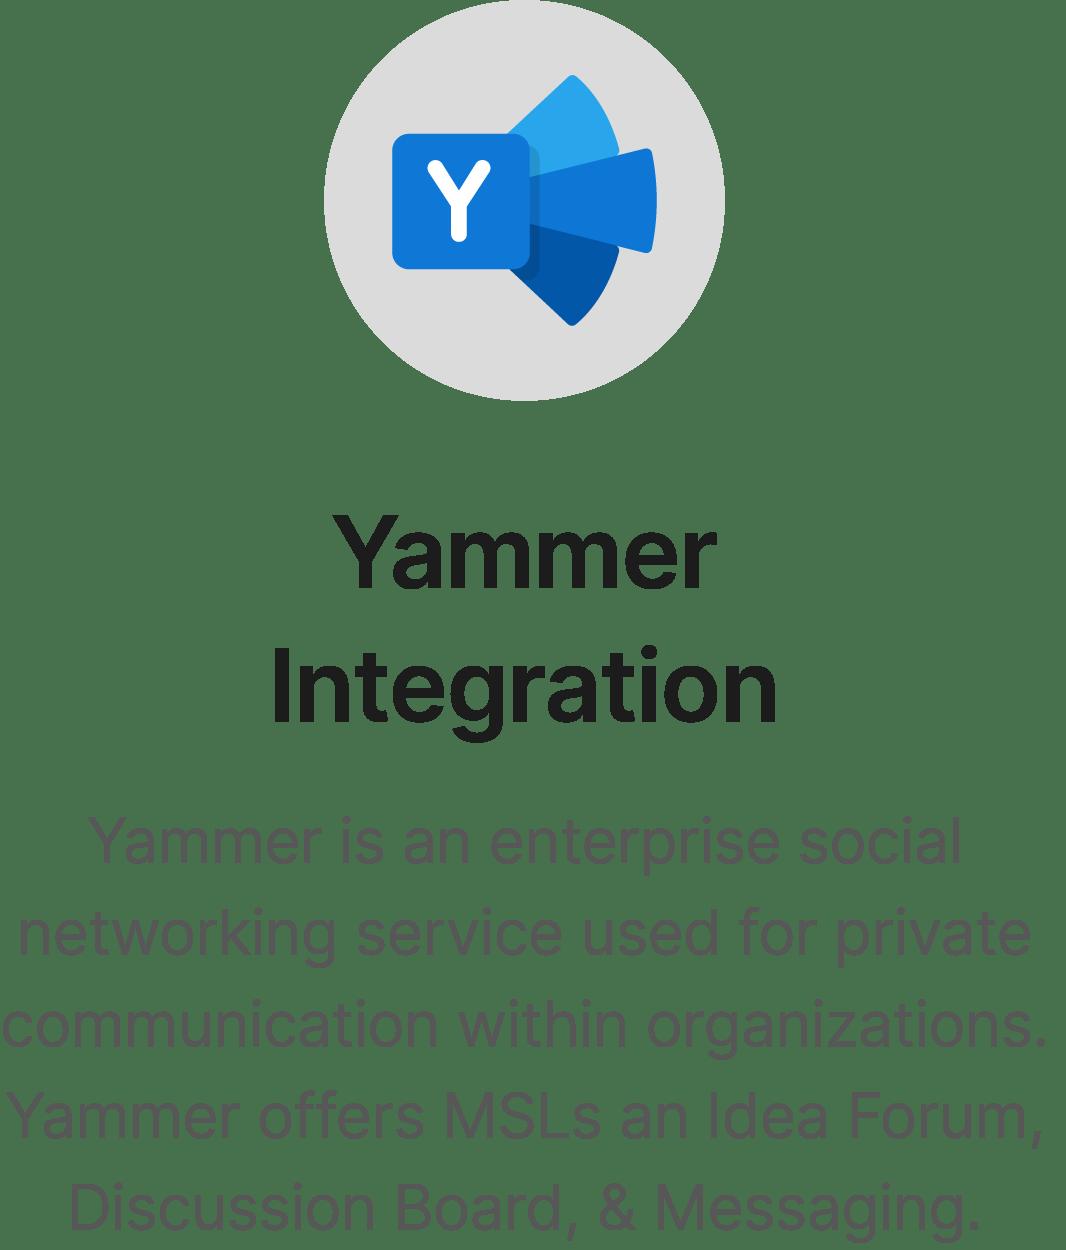 YammerIntegration